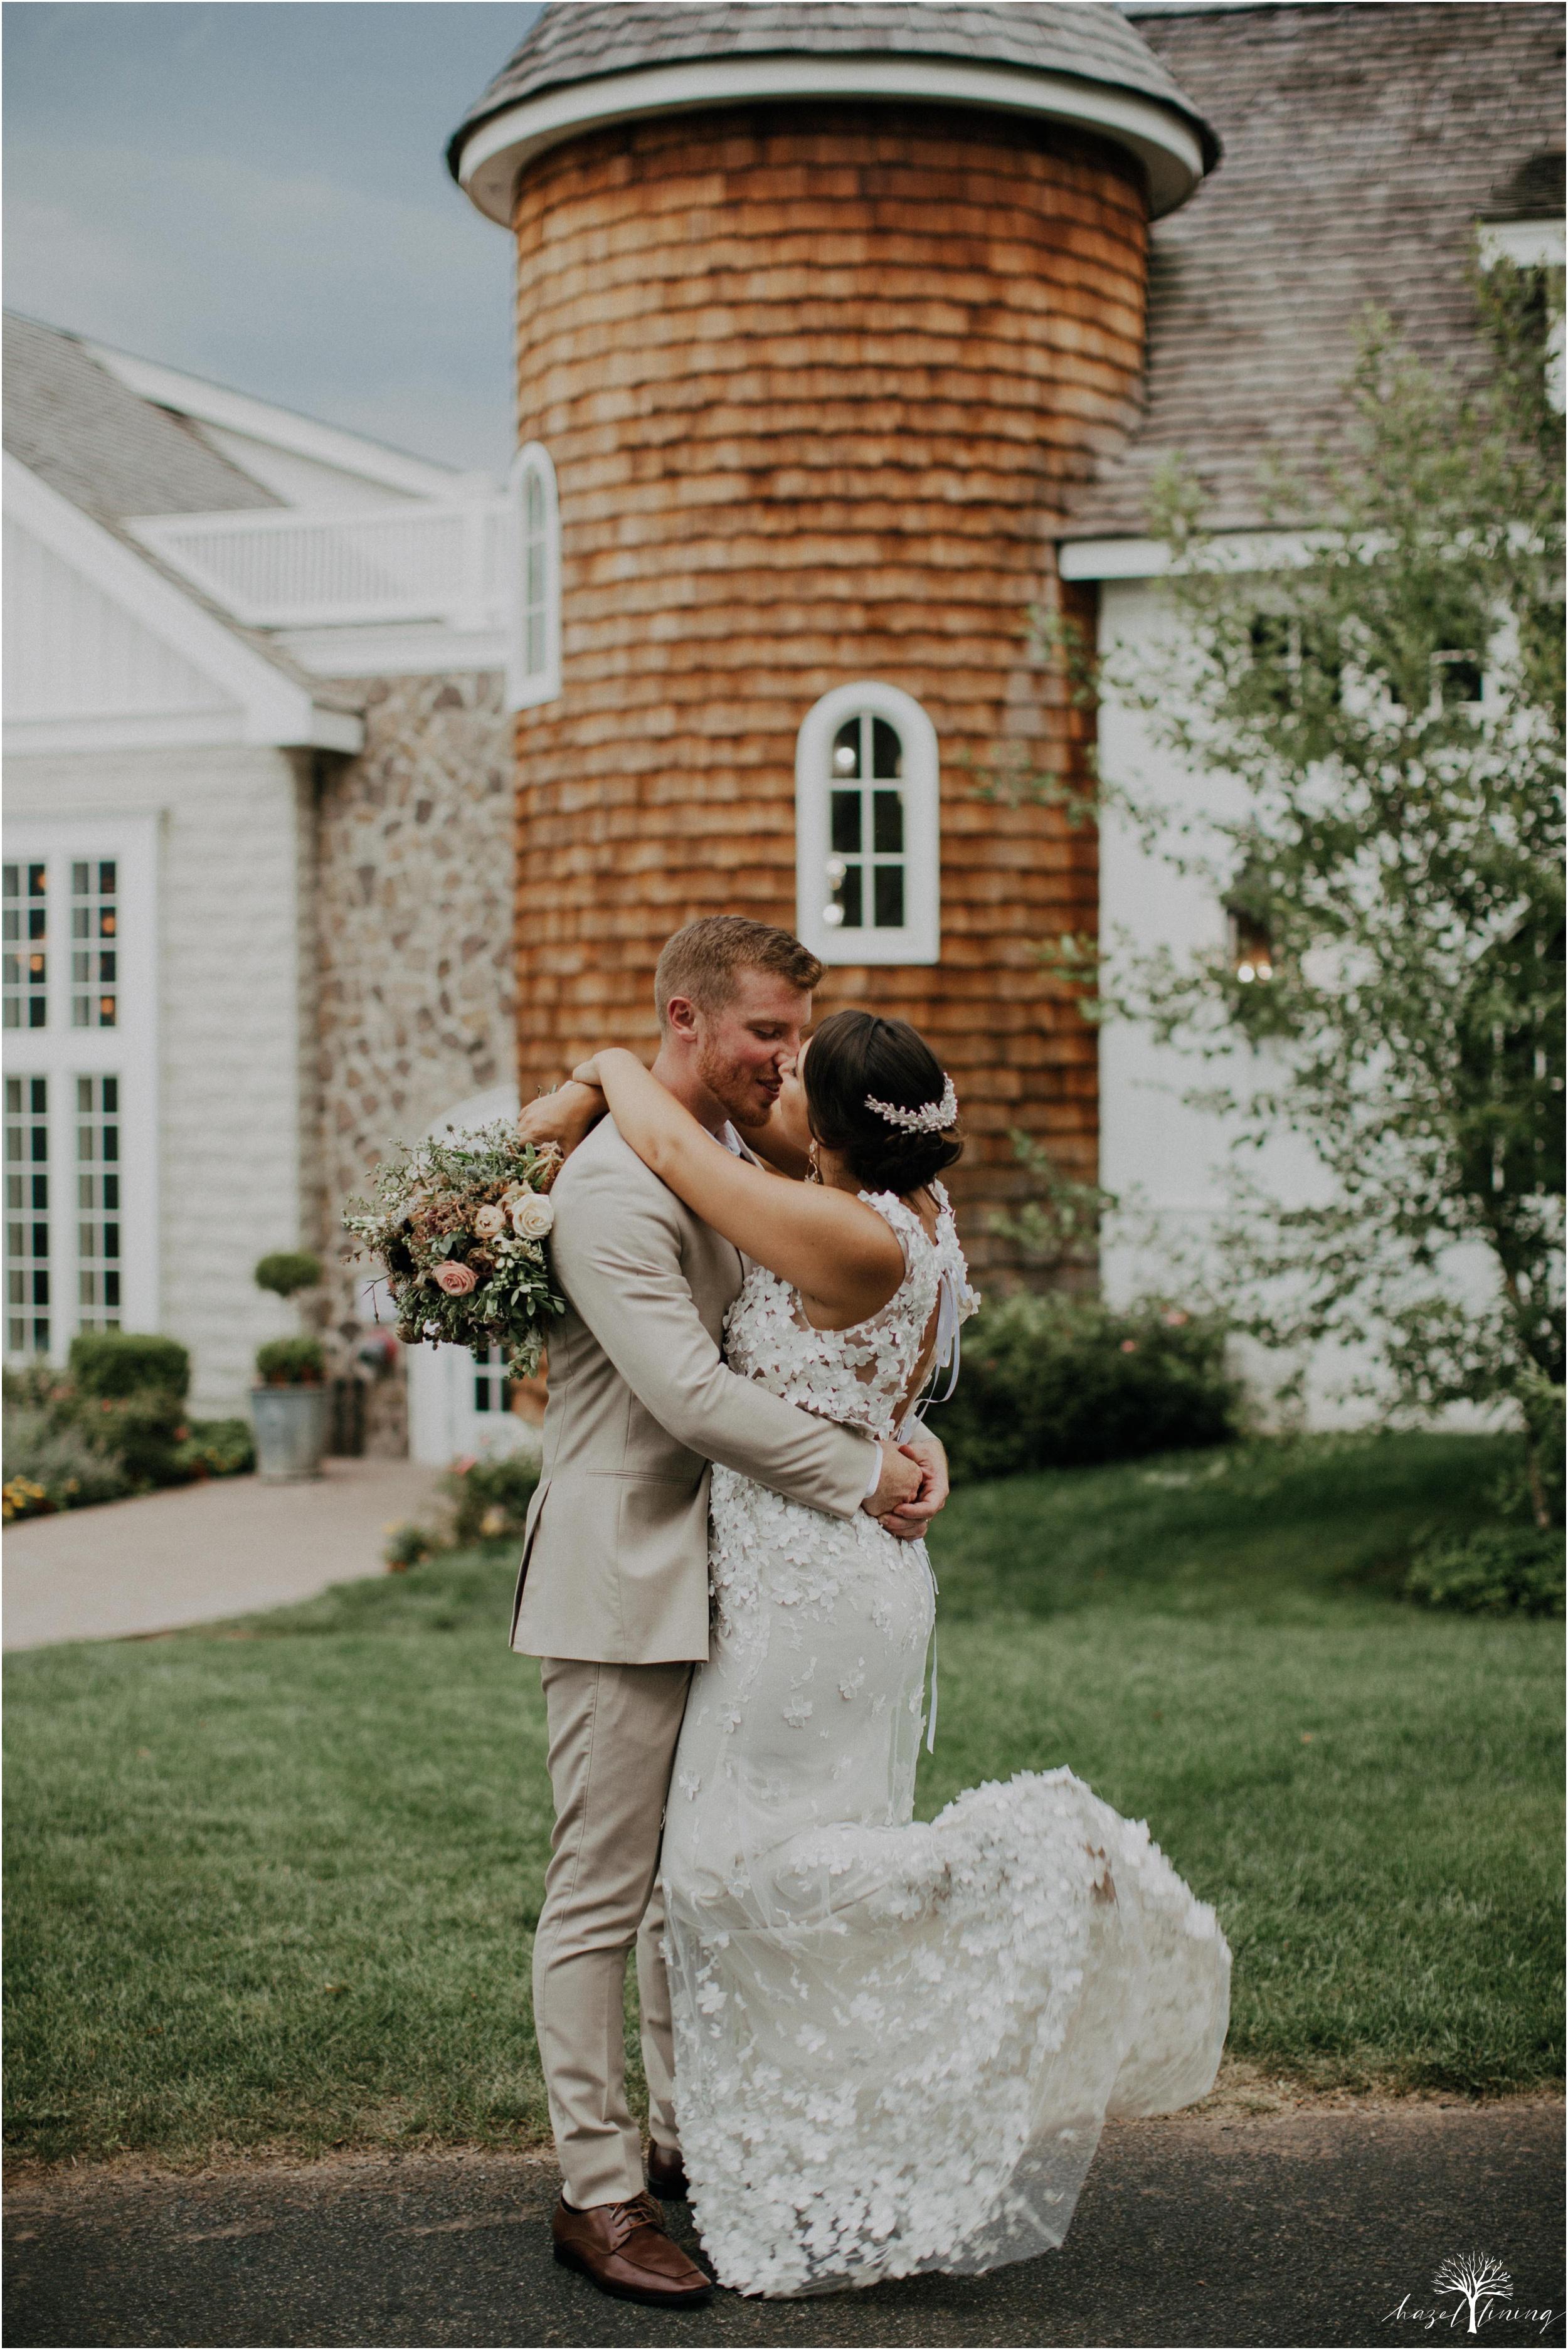 carl-chloe-the-ryland-inn-whitehouse-station-new-jersey-styled-squad-hazel-lining-photography-destination-elopement-wedding-engagement-photography_0035.jpg